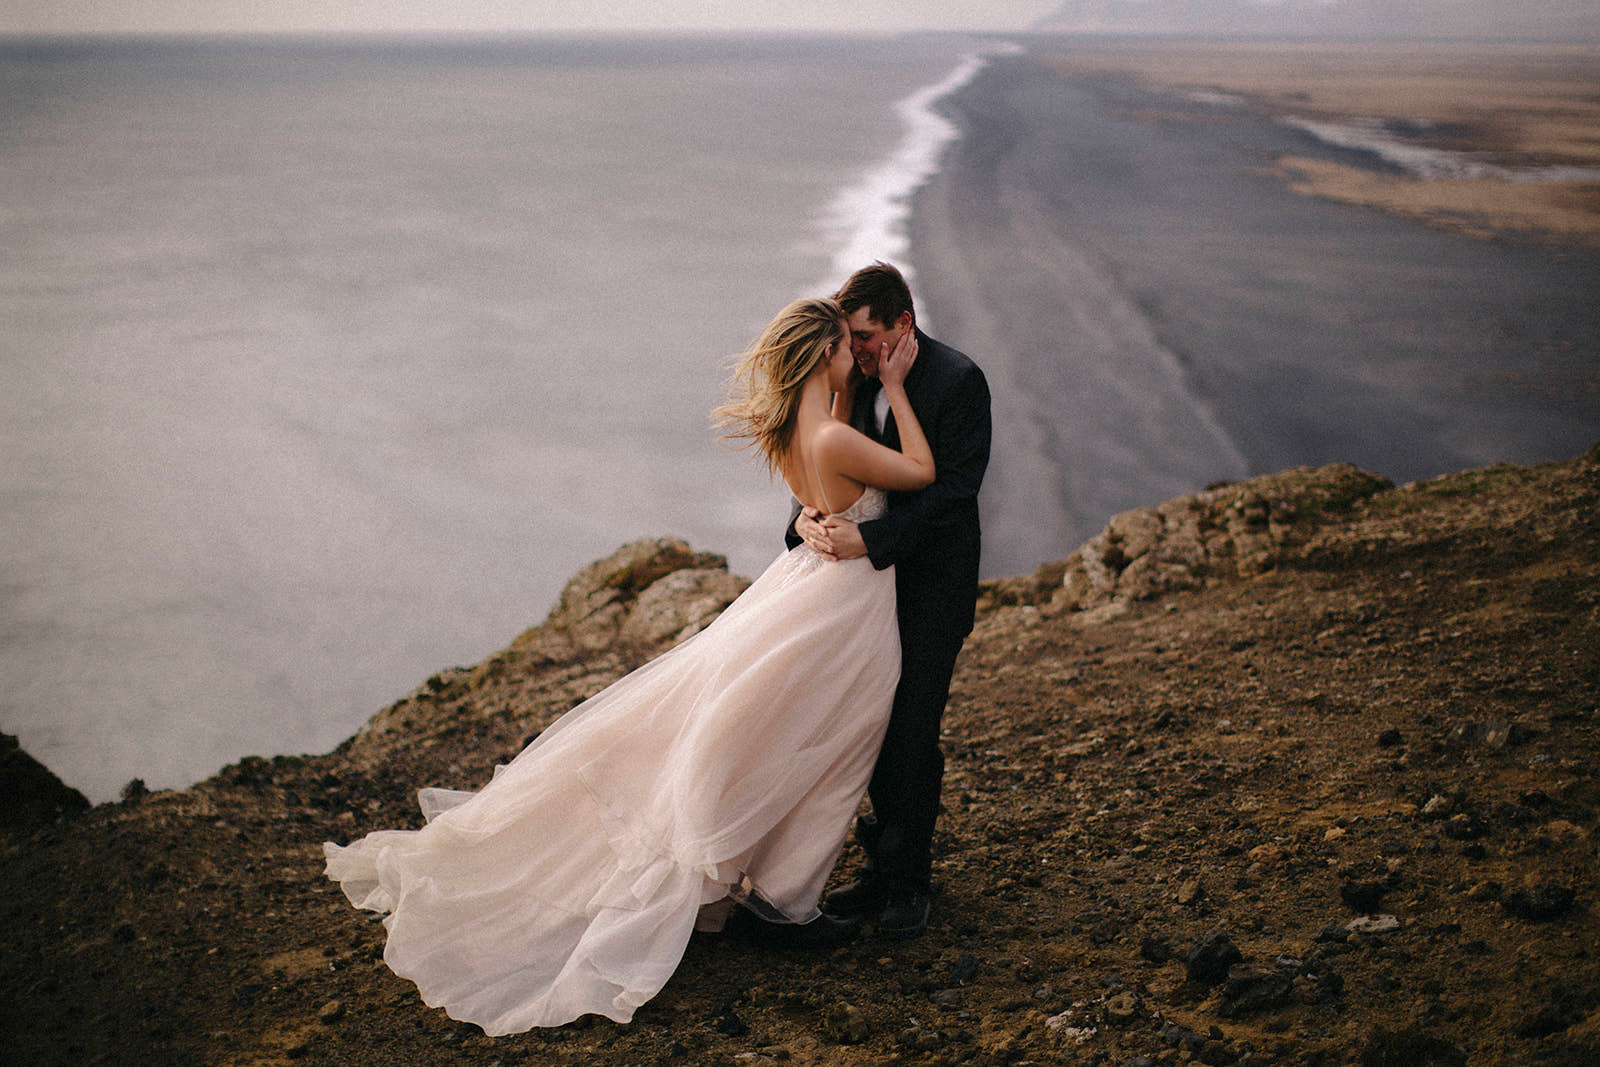 Liz Osban Photography Iceland Elopement Elope Wedding Dress Vestrahorn Mountain Stokksnes Hofn Black Sand Beach Destination Adventure Authentic Love Colorado Wyoming Engagement 4.jpg